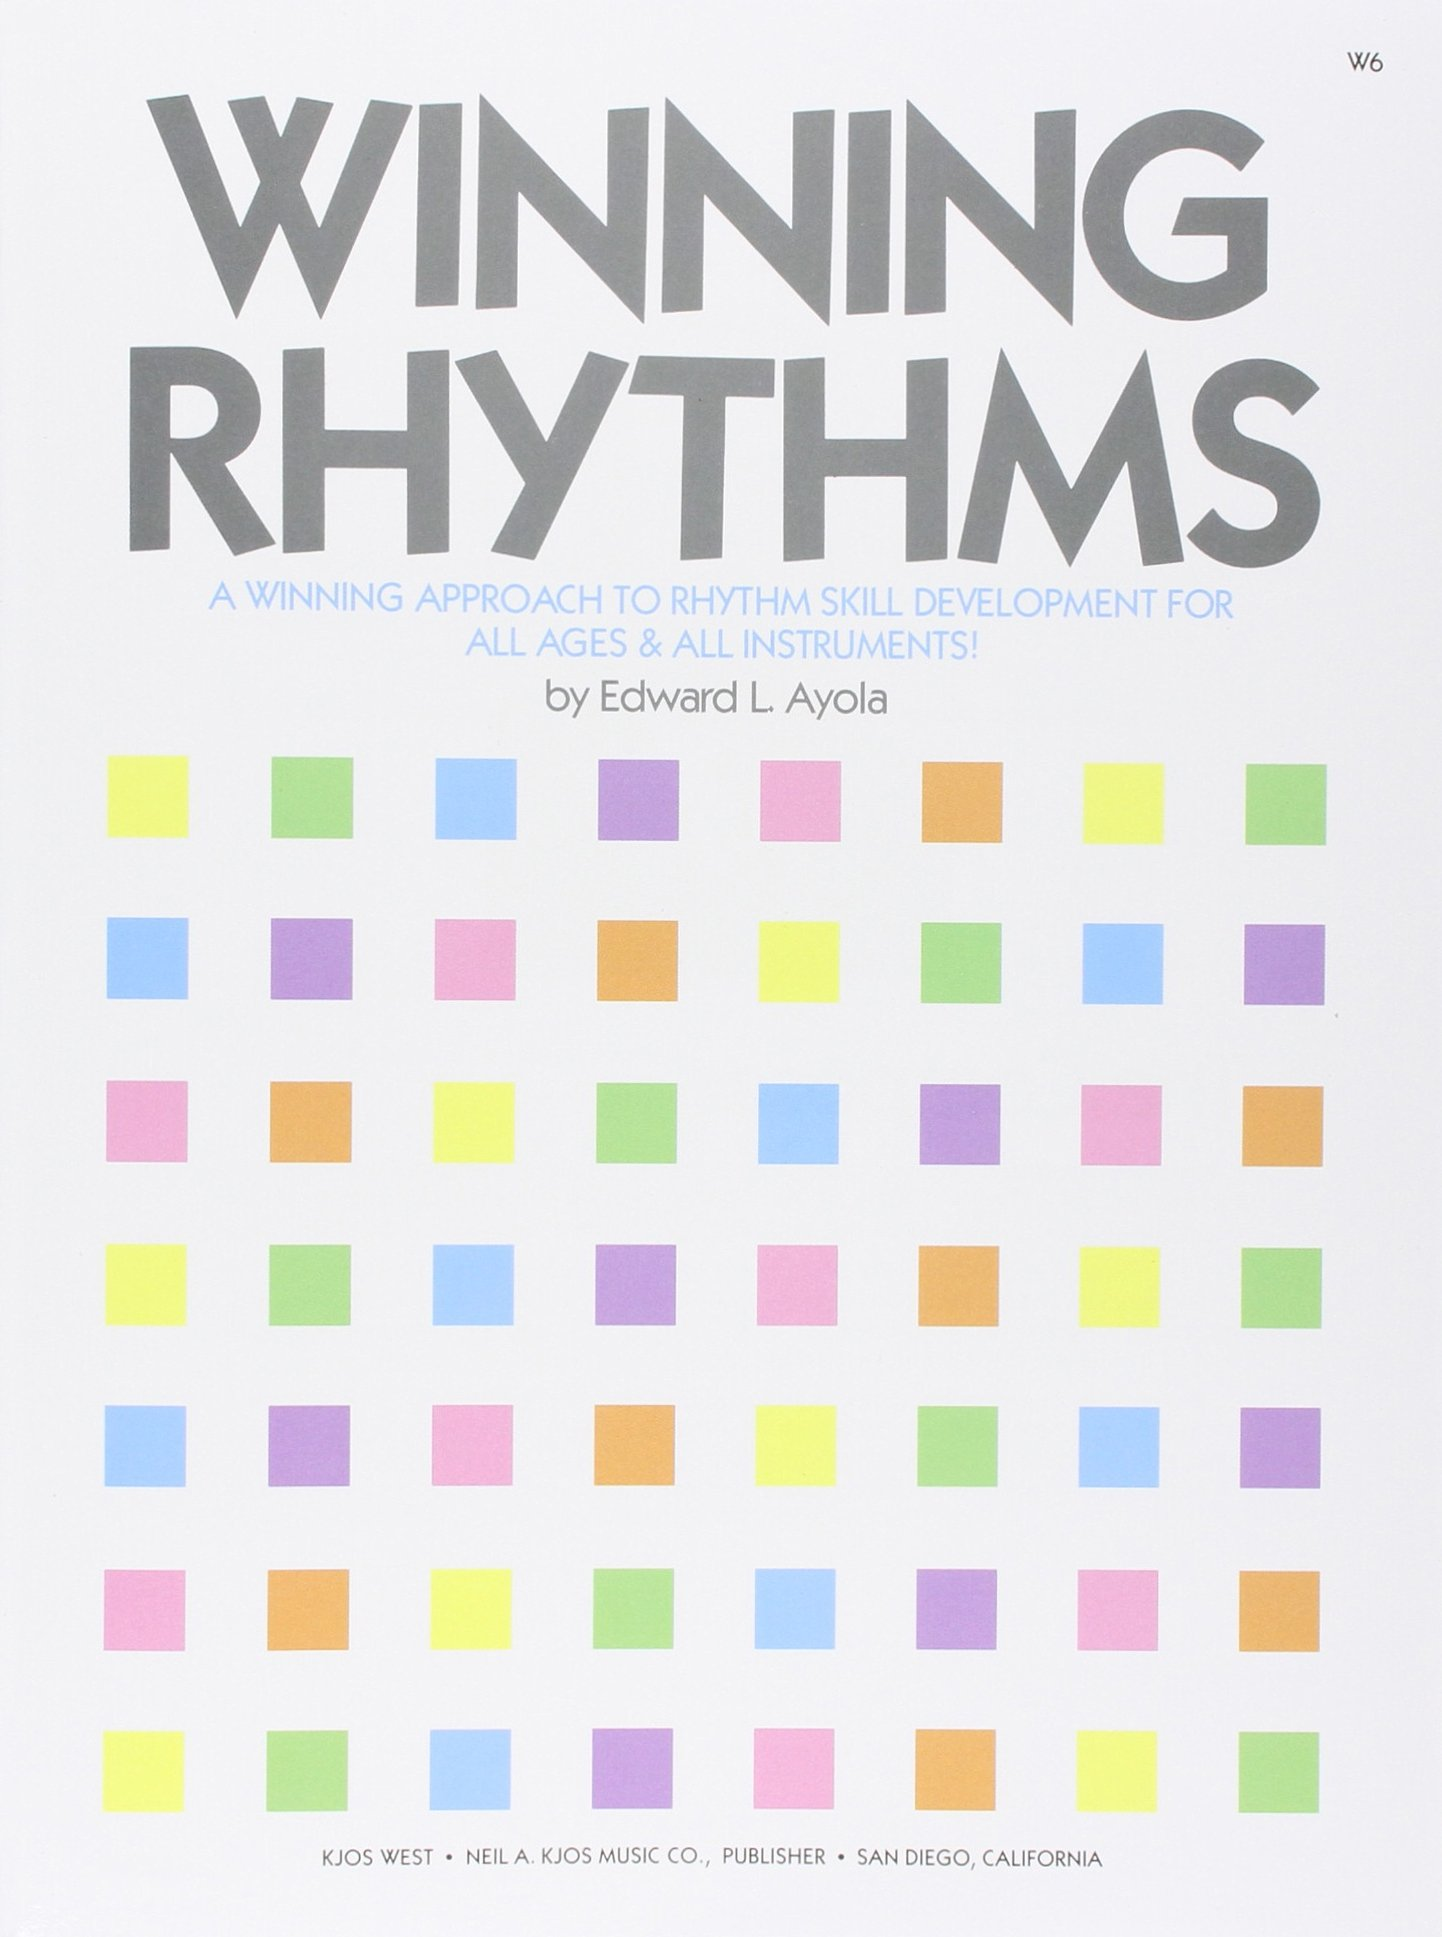 W6 Winning Rhythms Approach Development product image